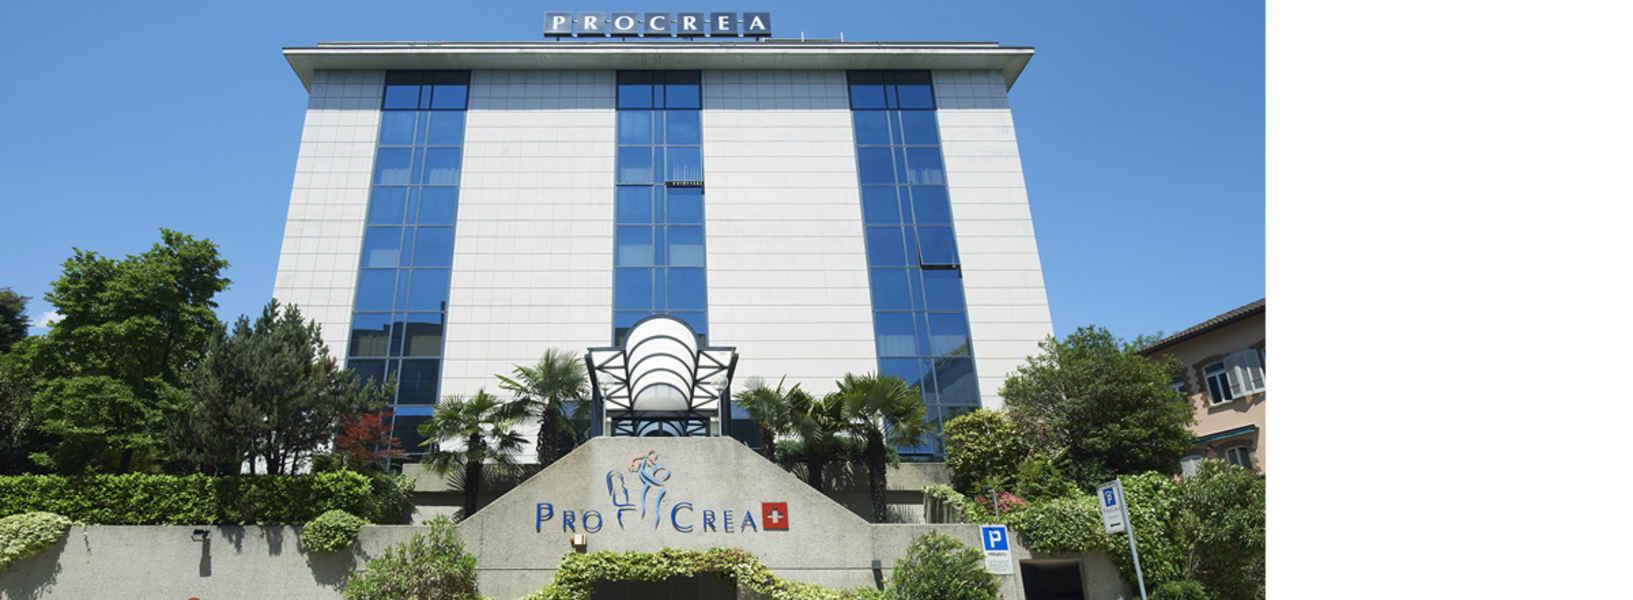 ProCrea - Swiss Fertility Center